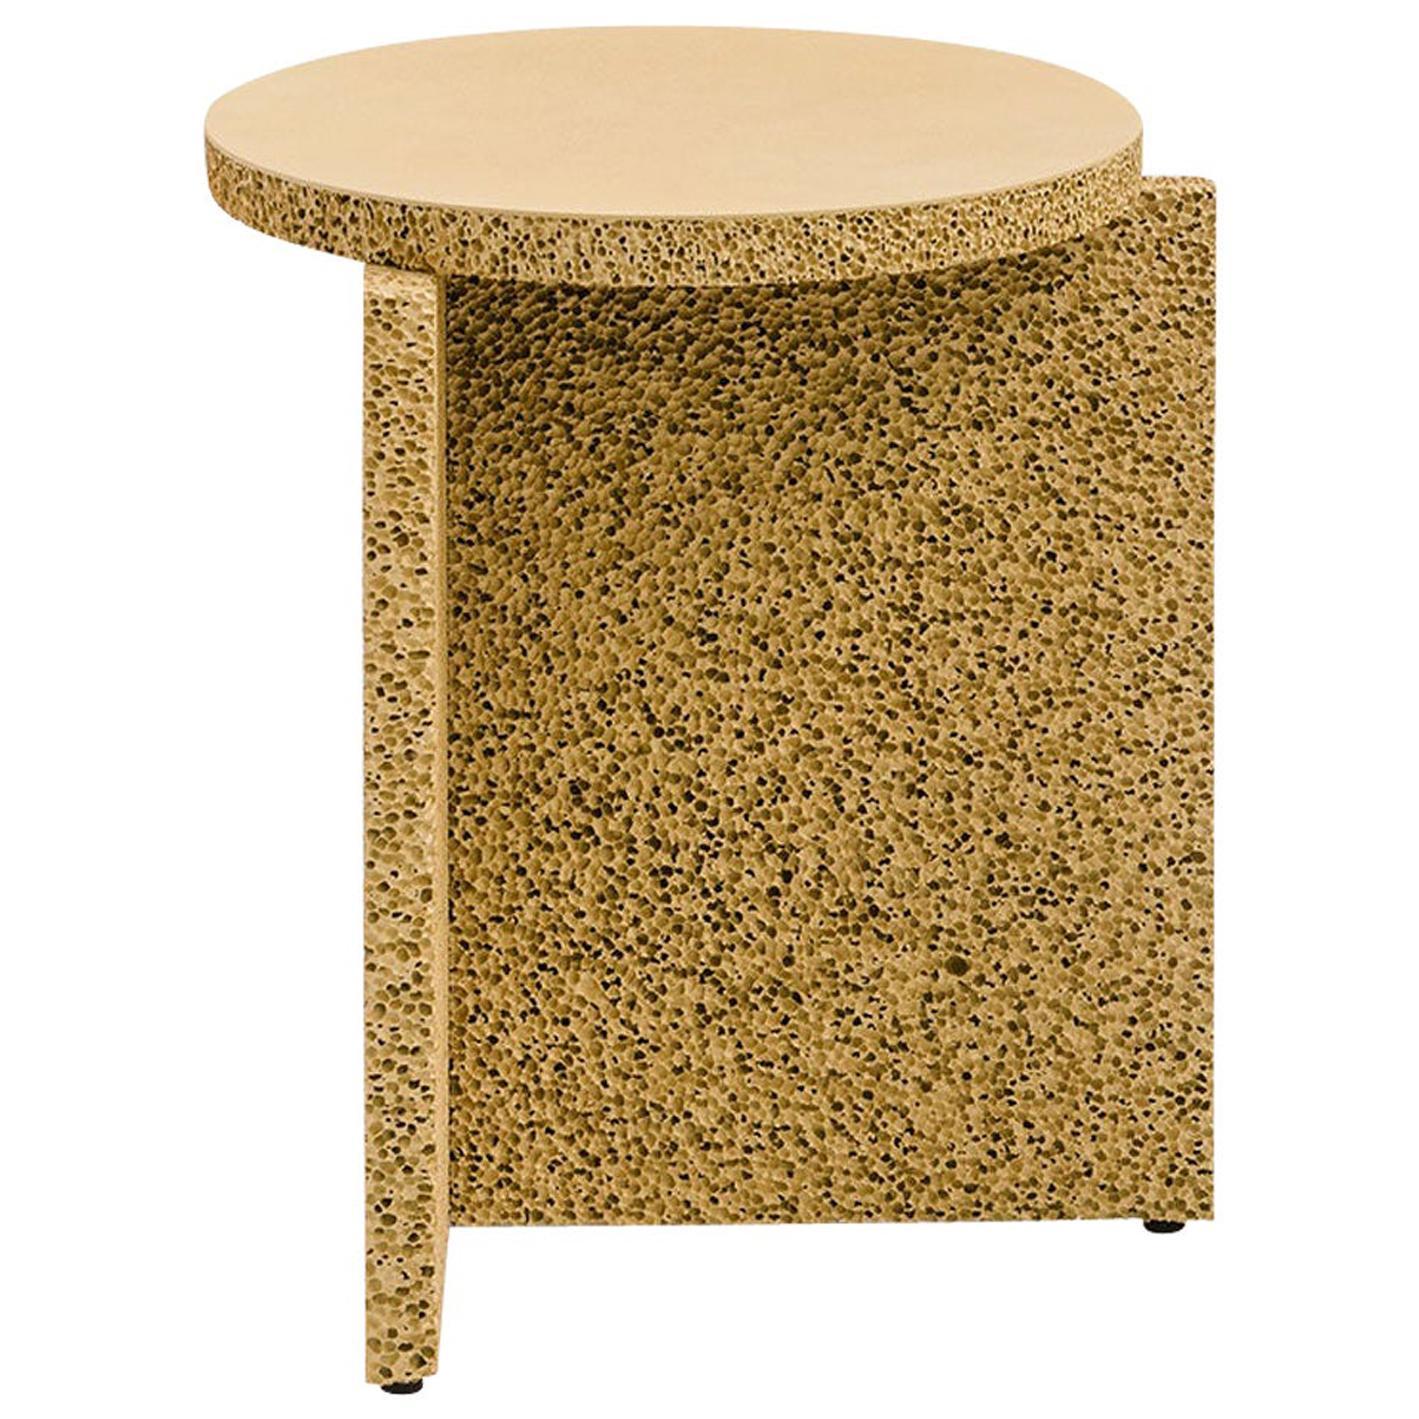 Sponge Table, Calen Knauf, Occasional Side, Tan, Painted, Foam Texture Aluminum